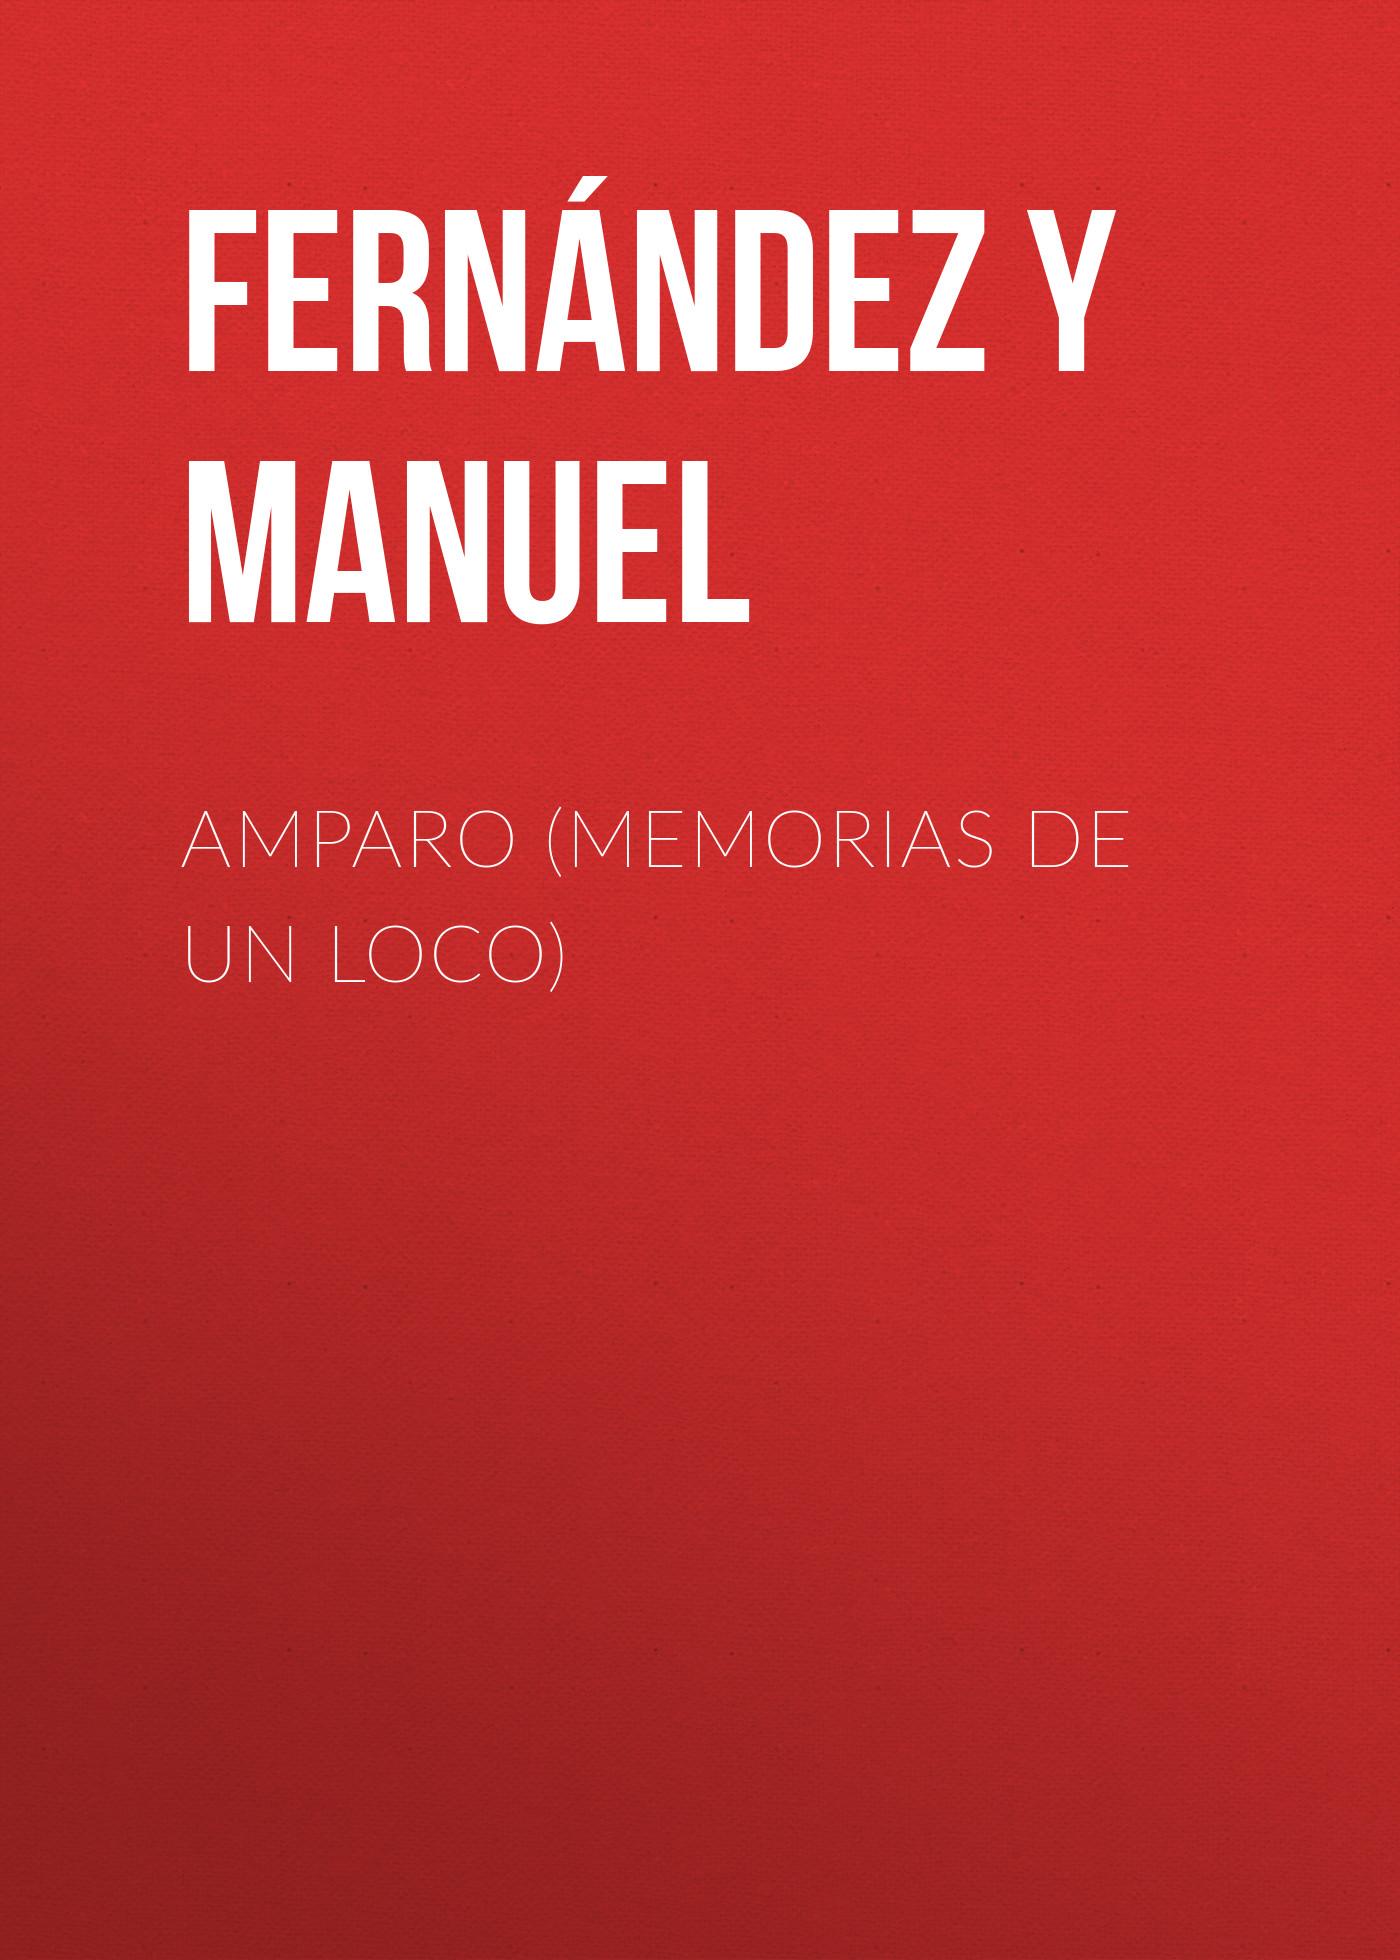 Fernández y González Manuel Amparo (Memorias de un loco) fernández y gonzález manuel los hermanos plantagenet